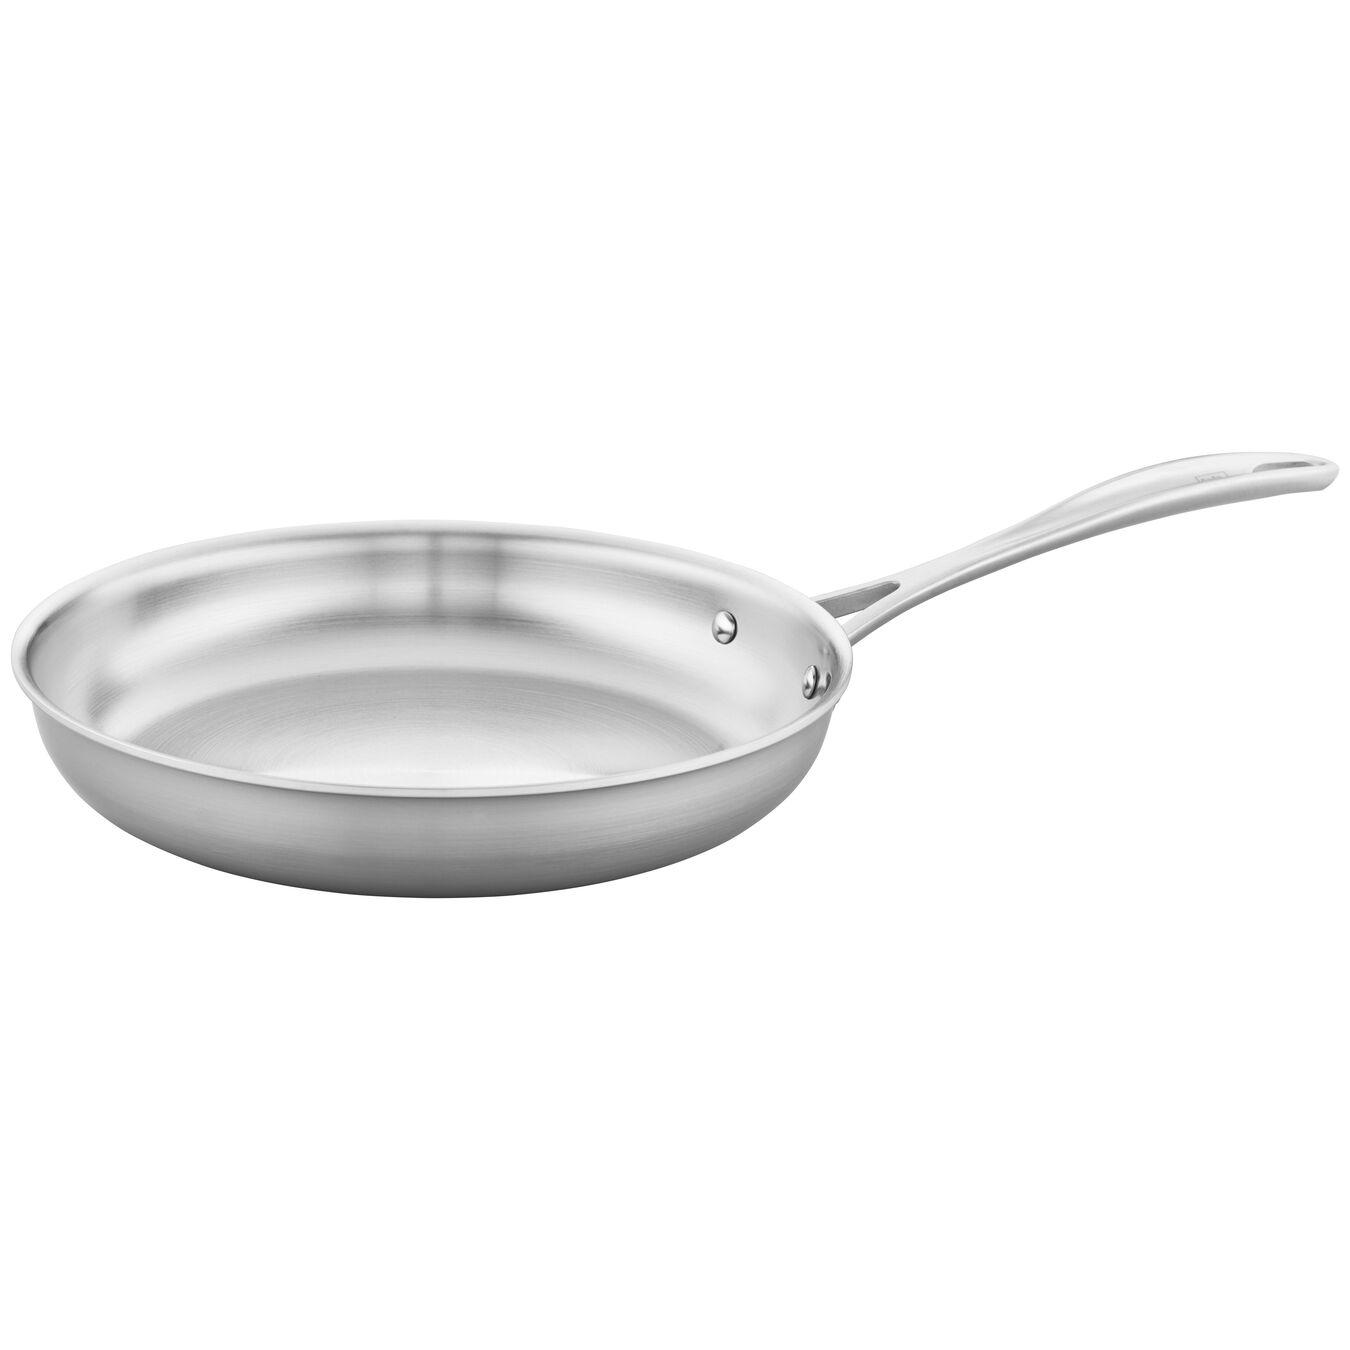 2-pc, stainless steel, Frying pan set,,large 5